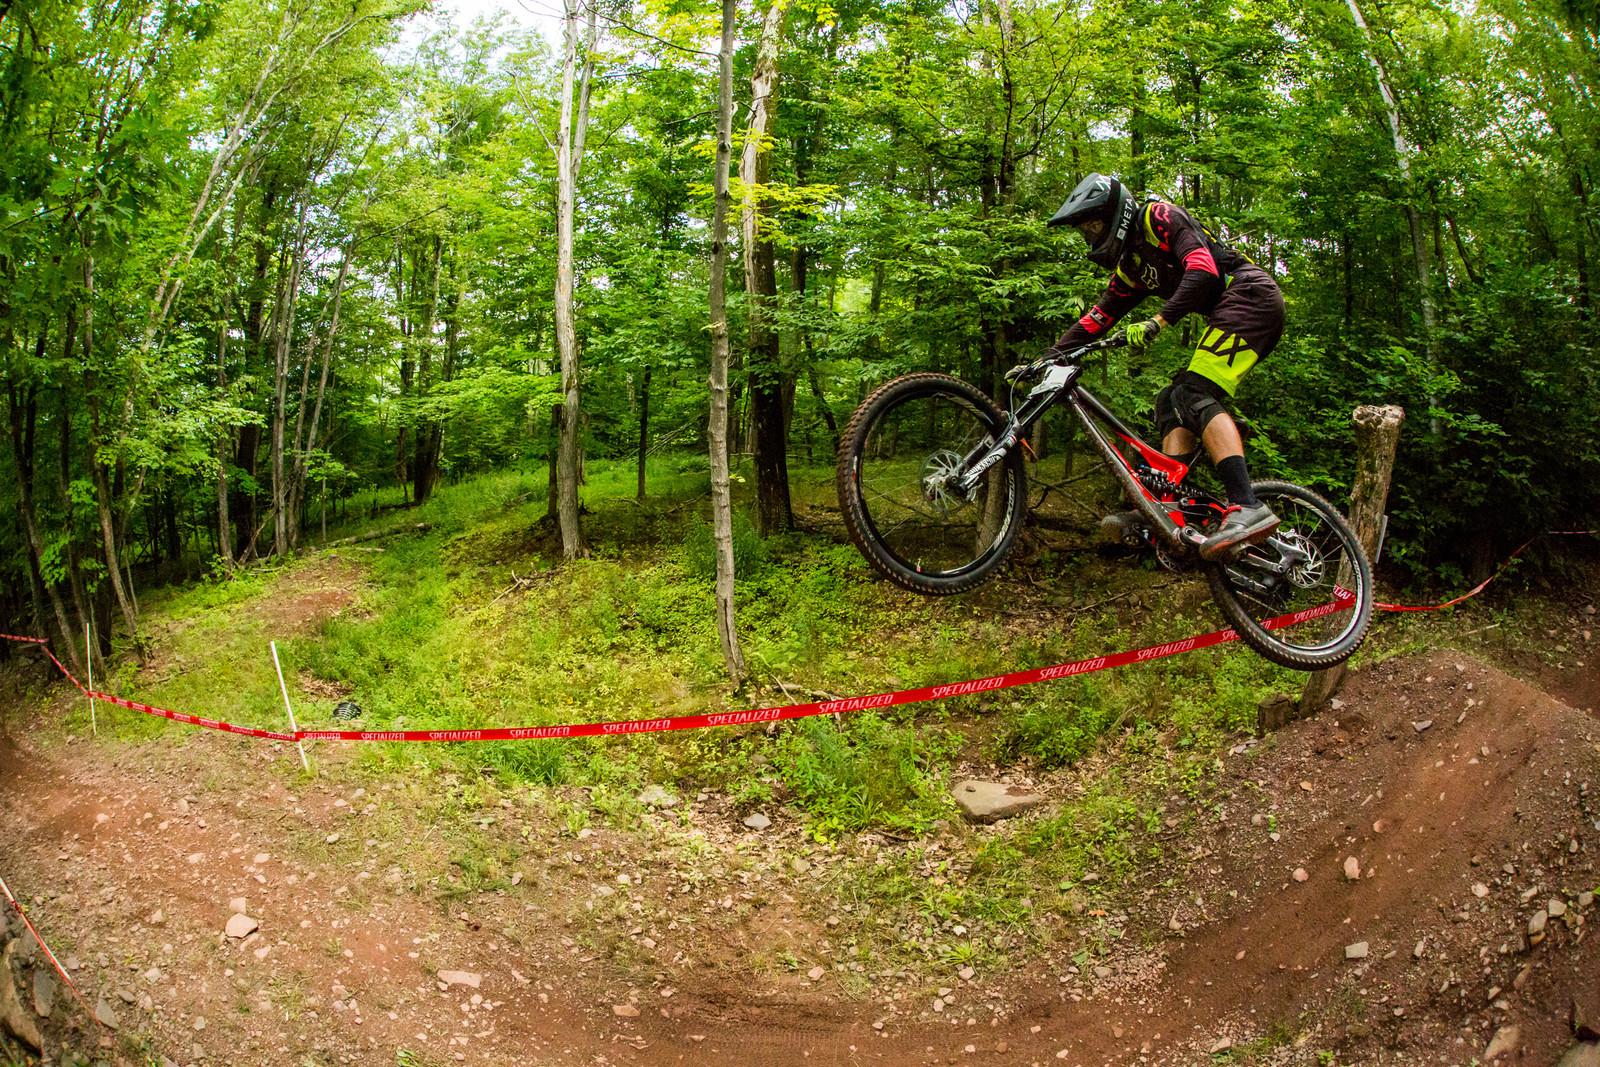 Austin Hackett-Klaube - RACE DAY GALLERY - 2017 Pro GRT, Windham, NY - Mountain Biking Pictures - Vital MTB